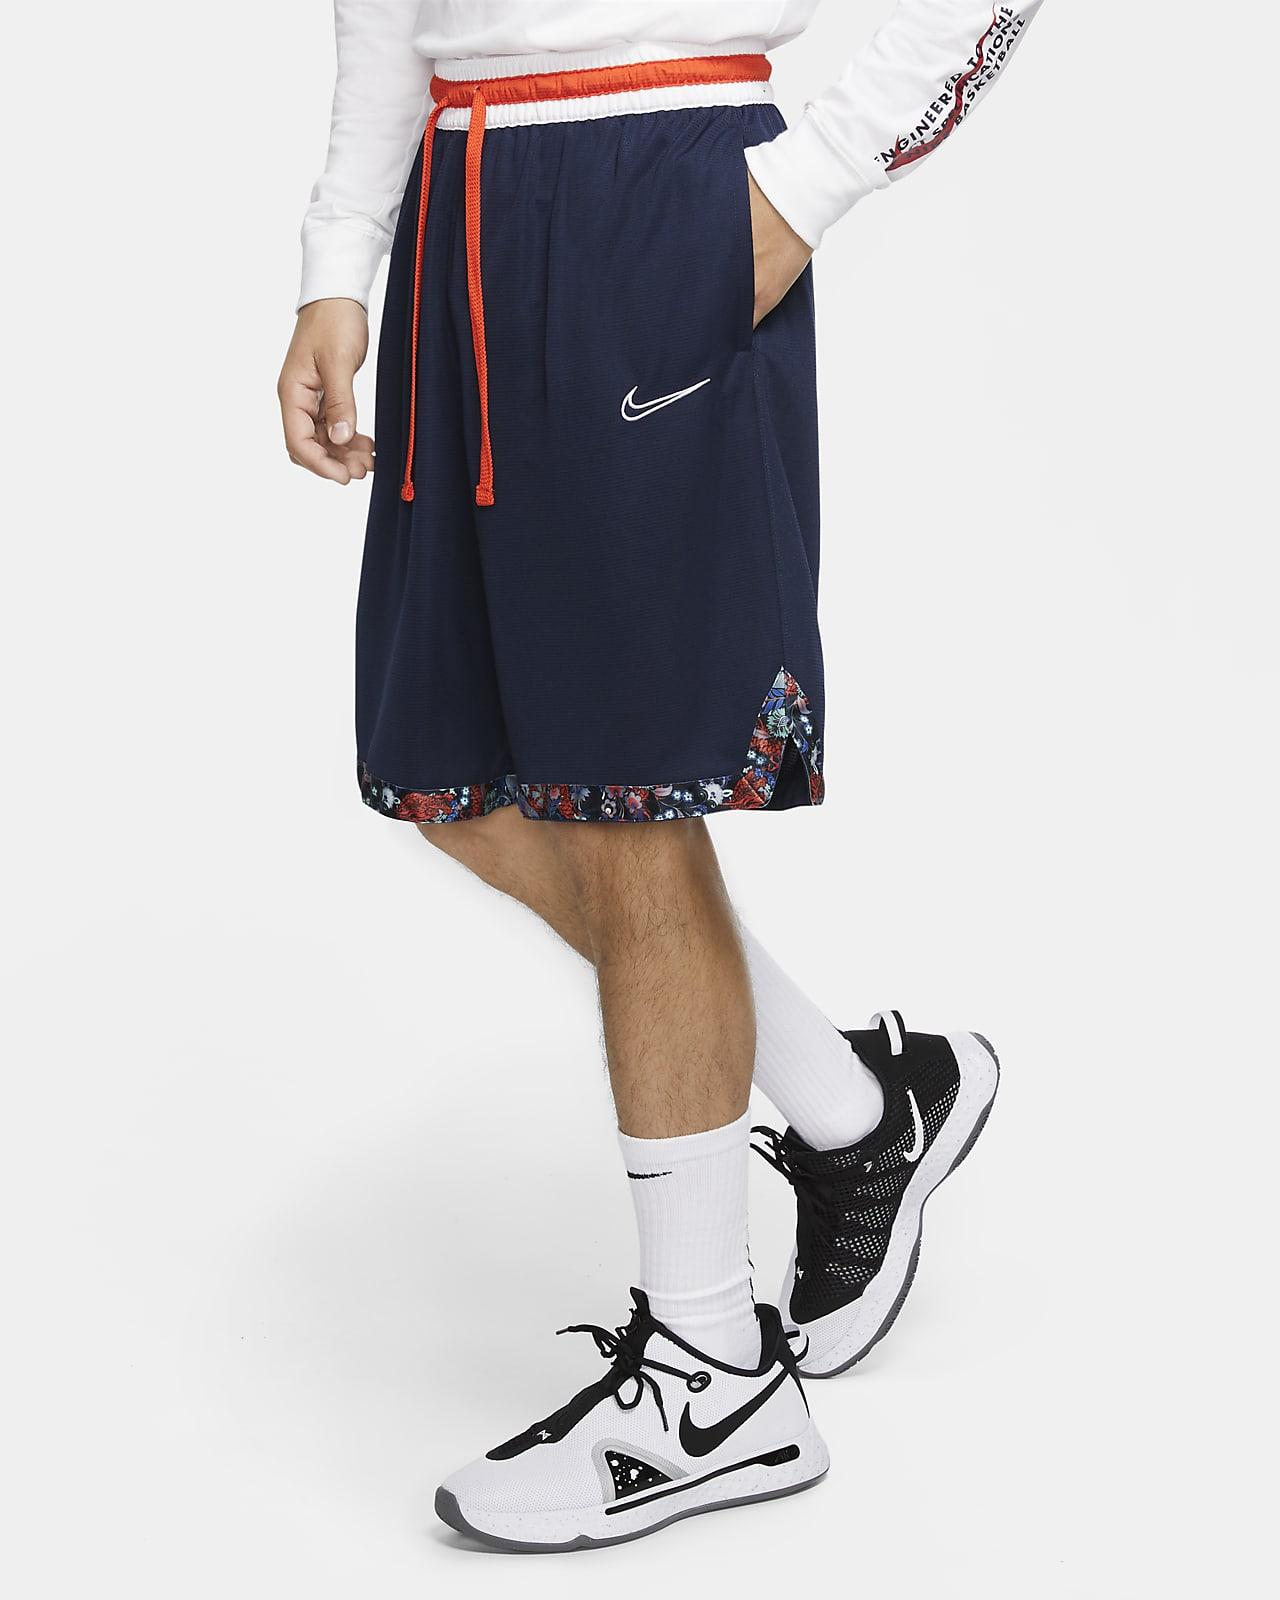 Nike Dri-FIT DNA Basketball Shorts